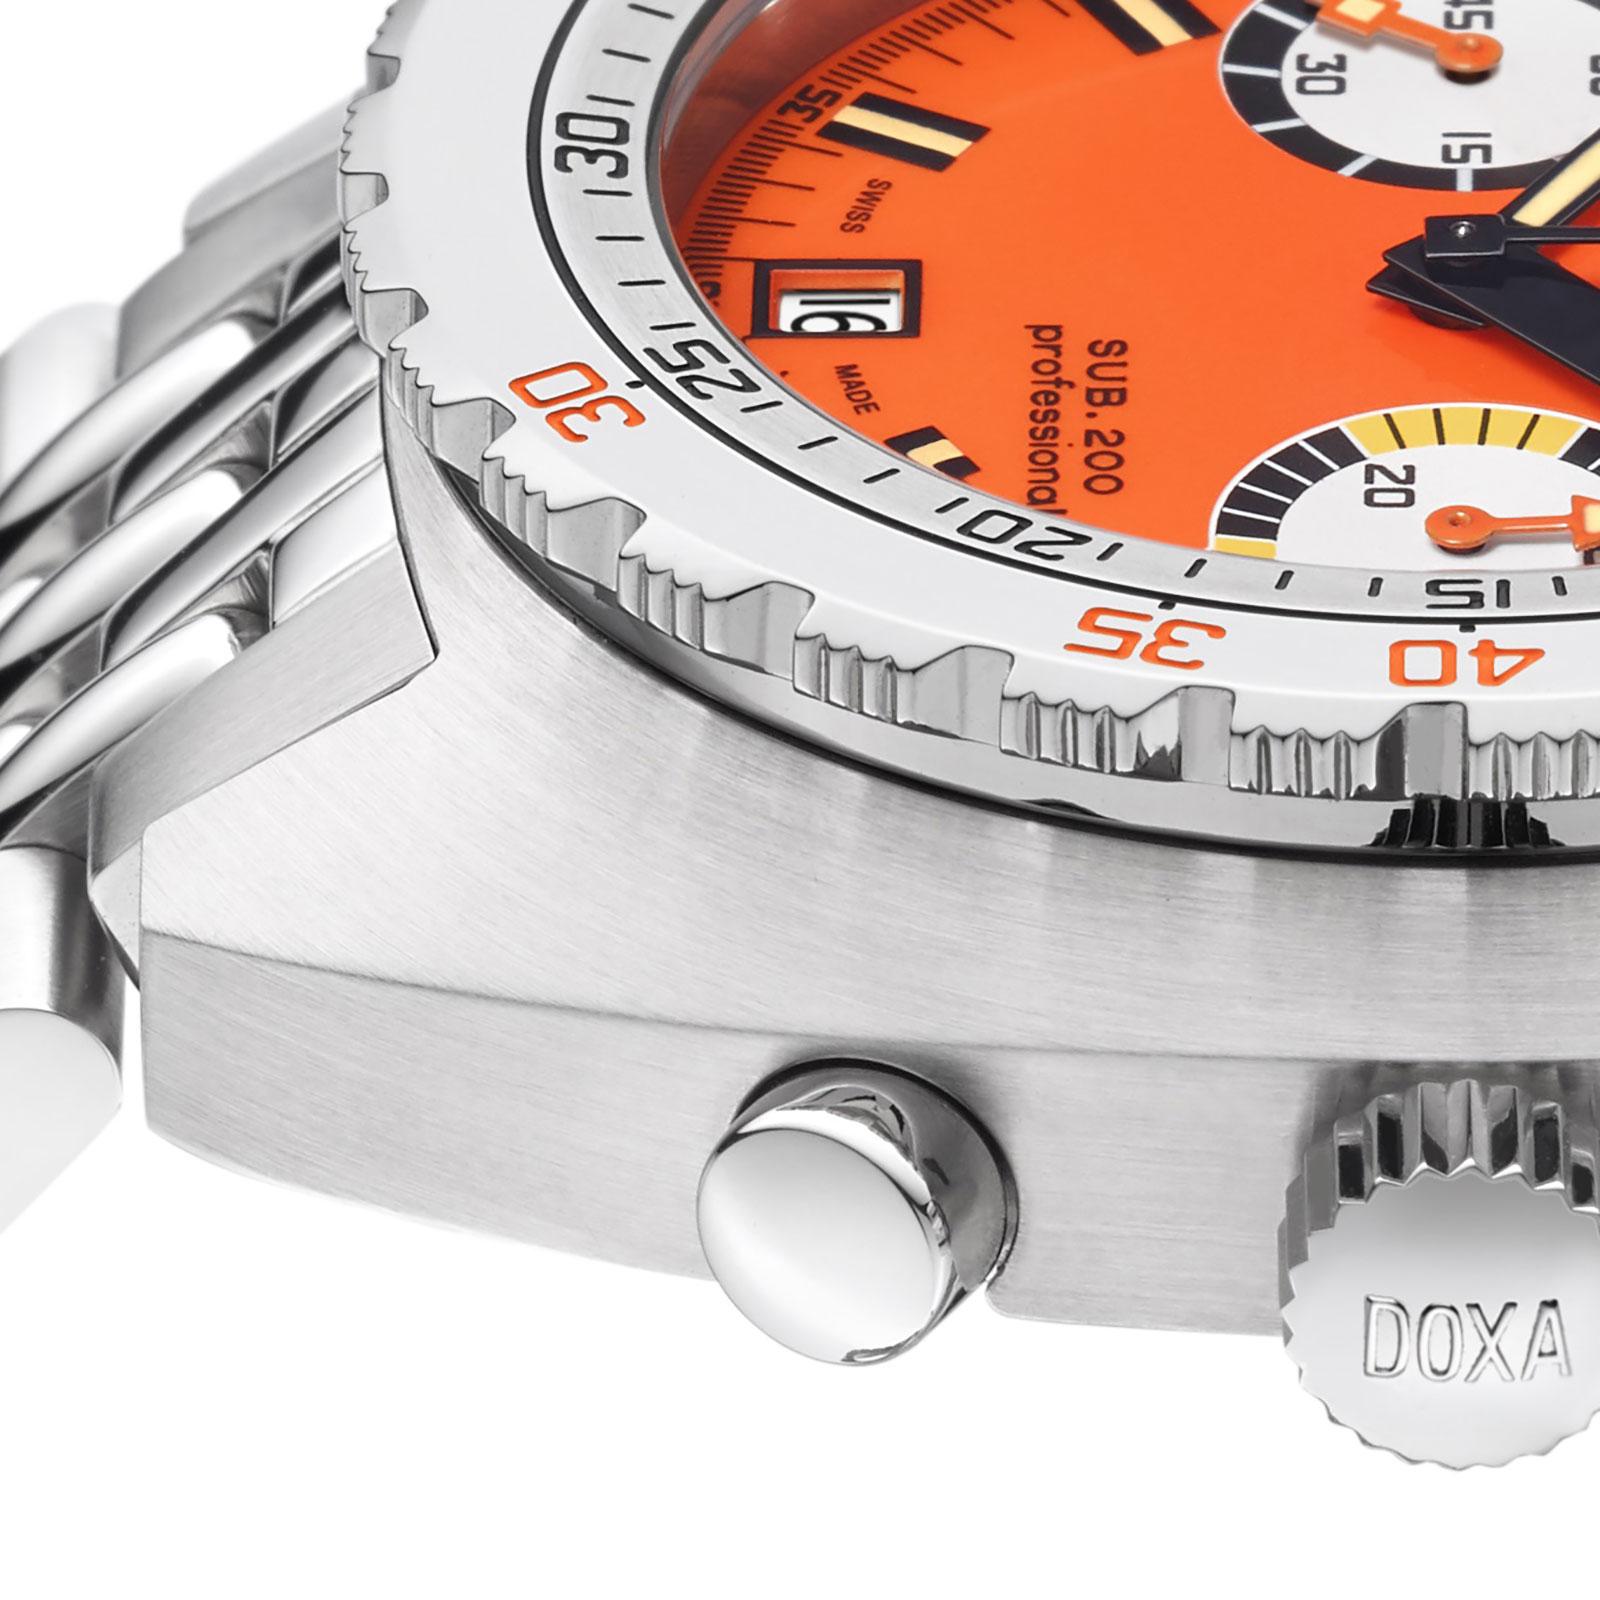 doxa Sub 200 T.Graph steel chronograph 2